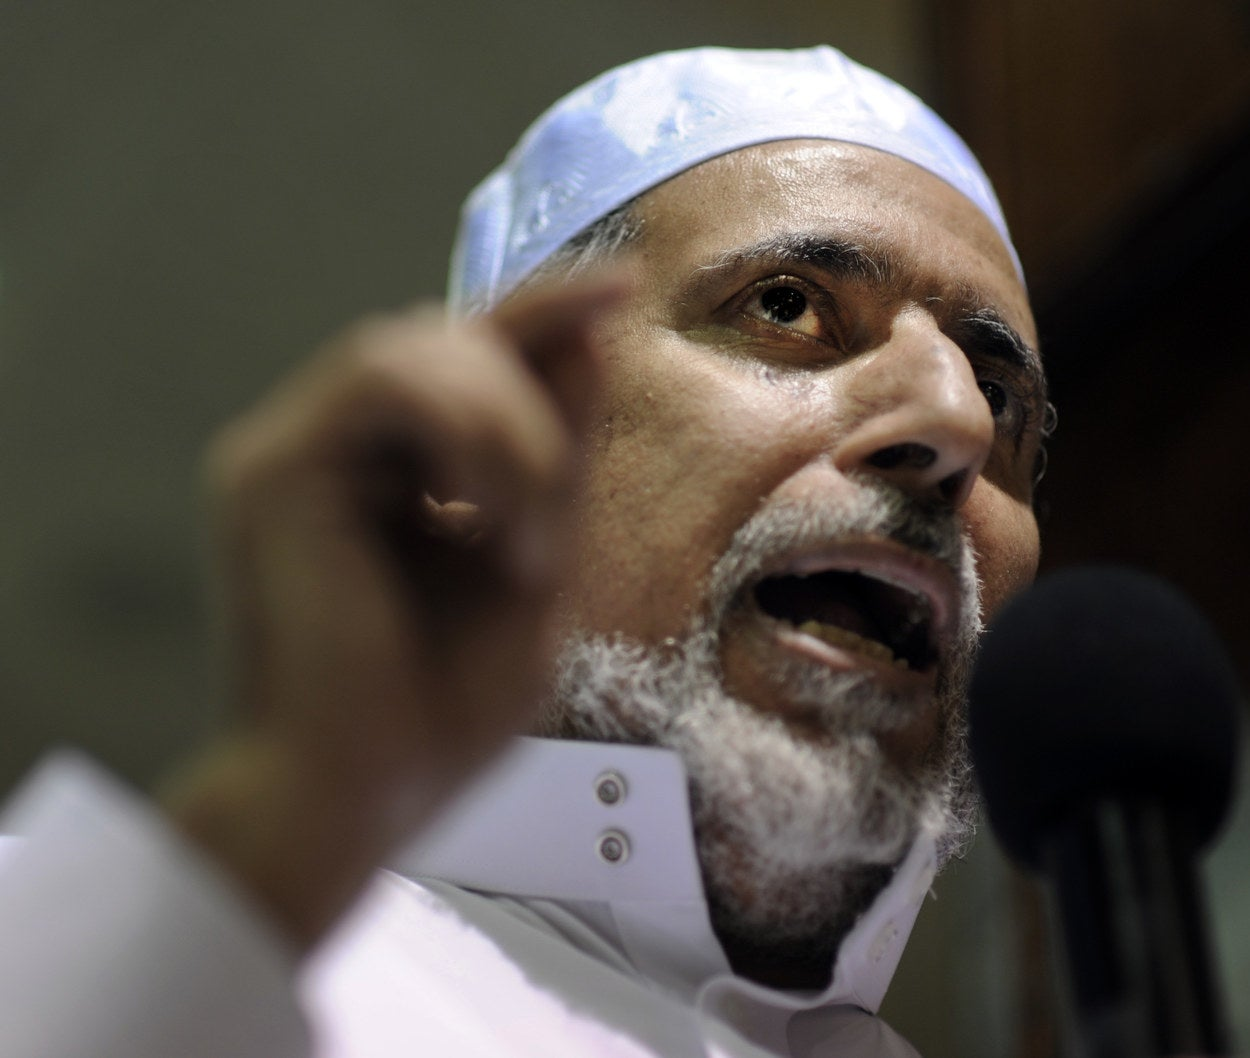 Imam Shaker Elsayed of the Dar al-Hijrah Islamic Center in 2011.